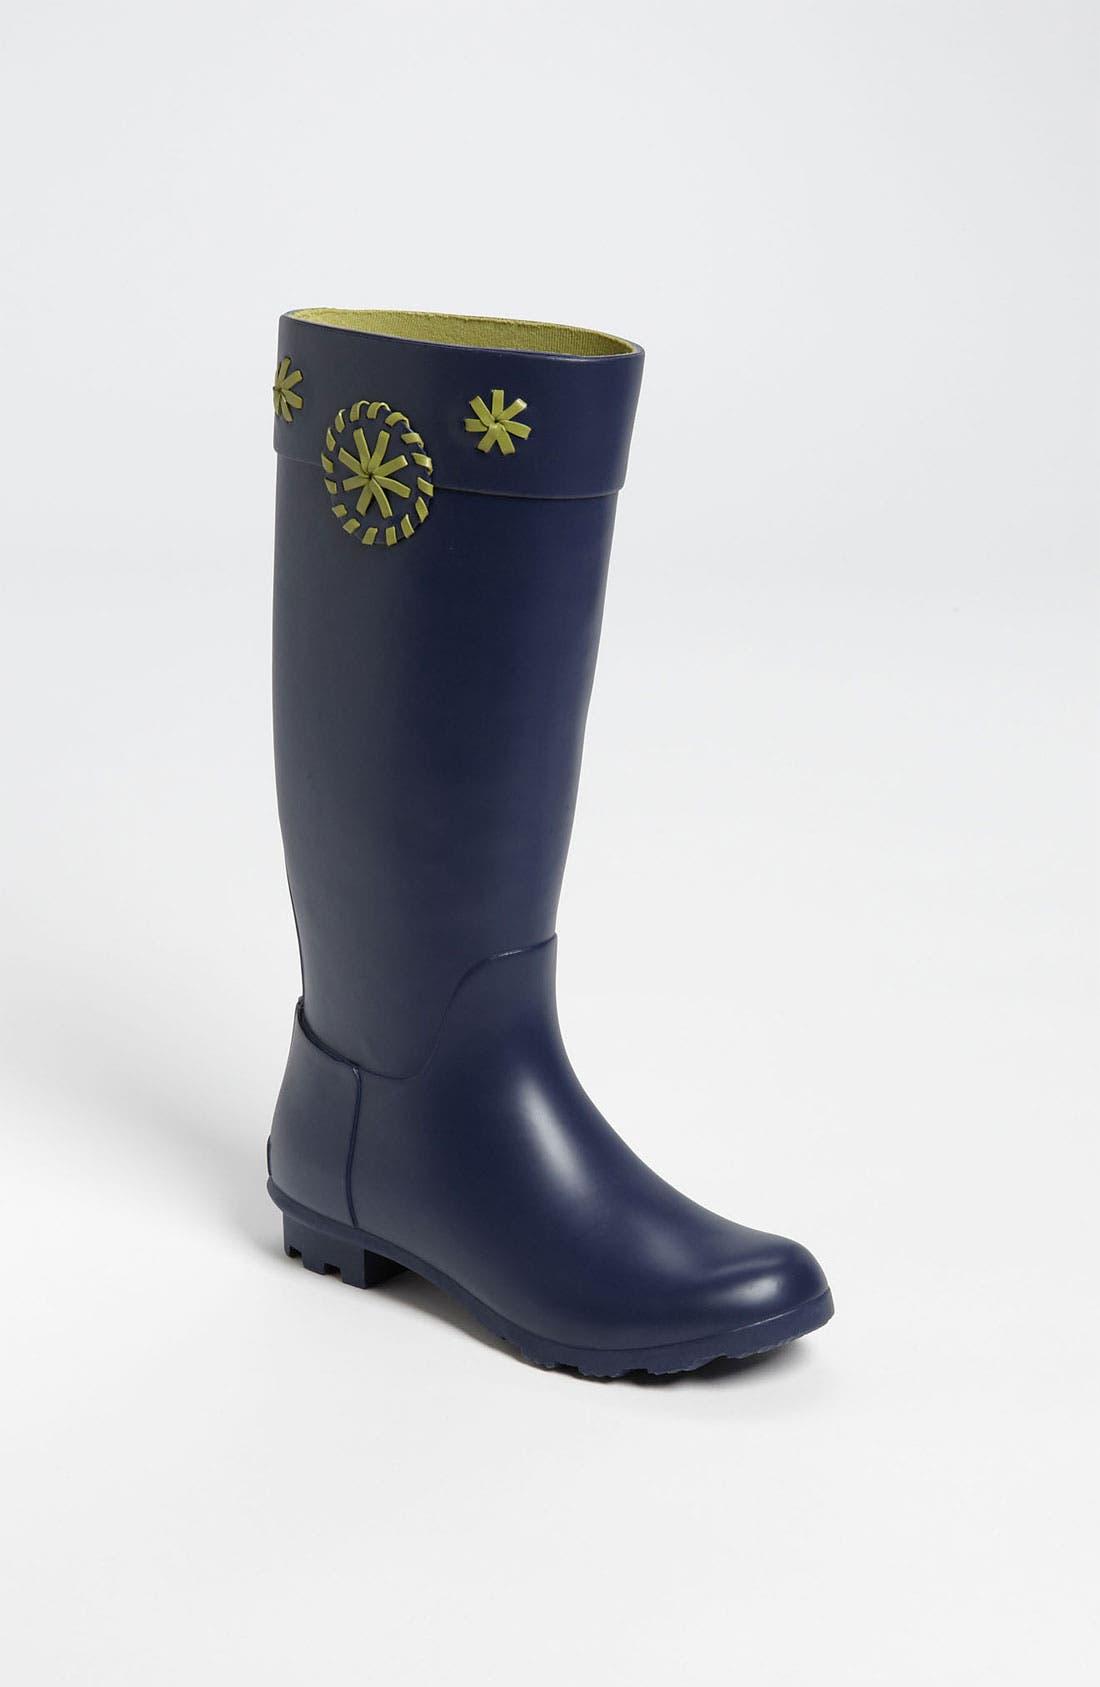 Alternate Image 1 Selected - Jack Rogers 'Whirlaway' Rain Boot (Women)